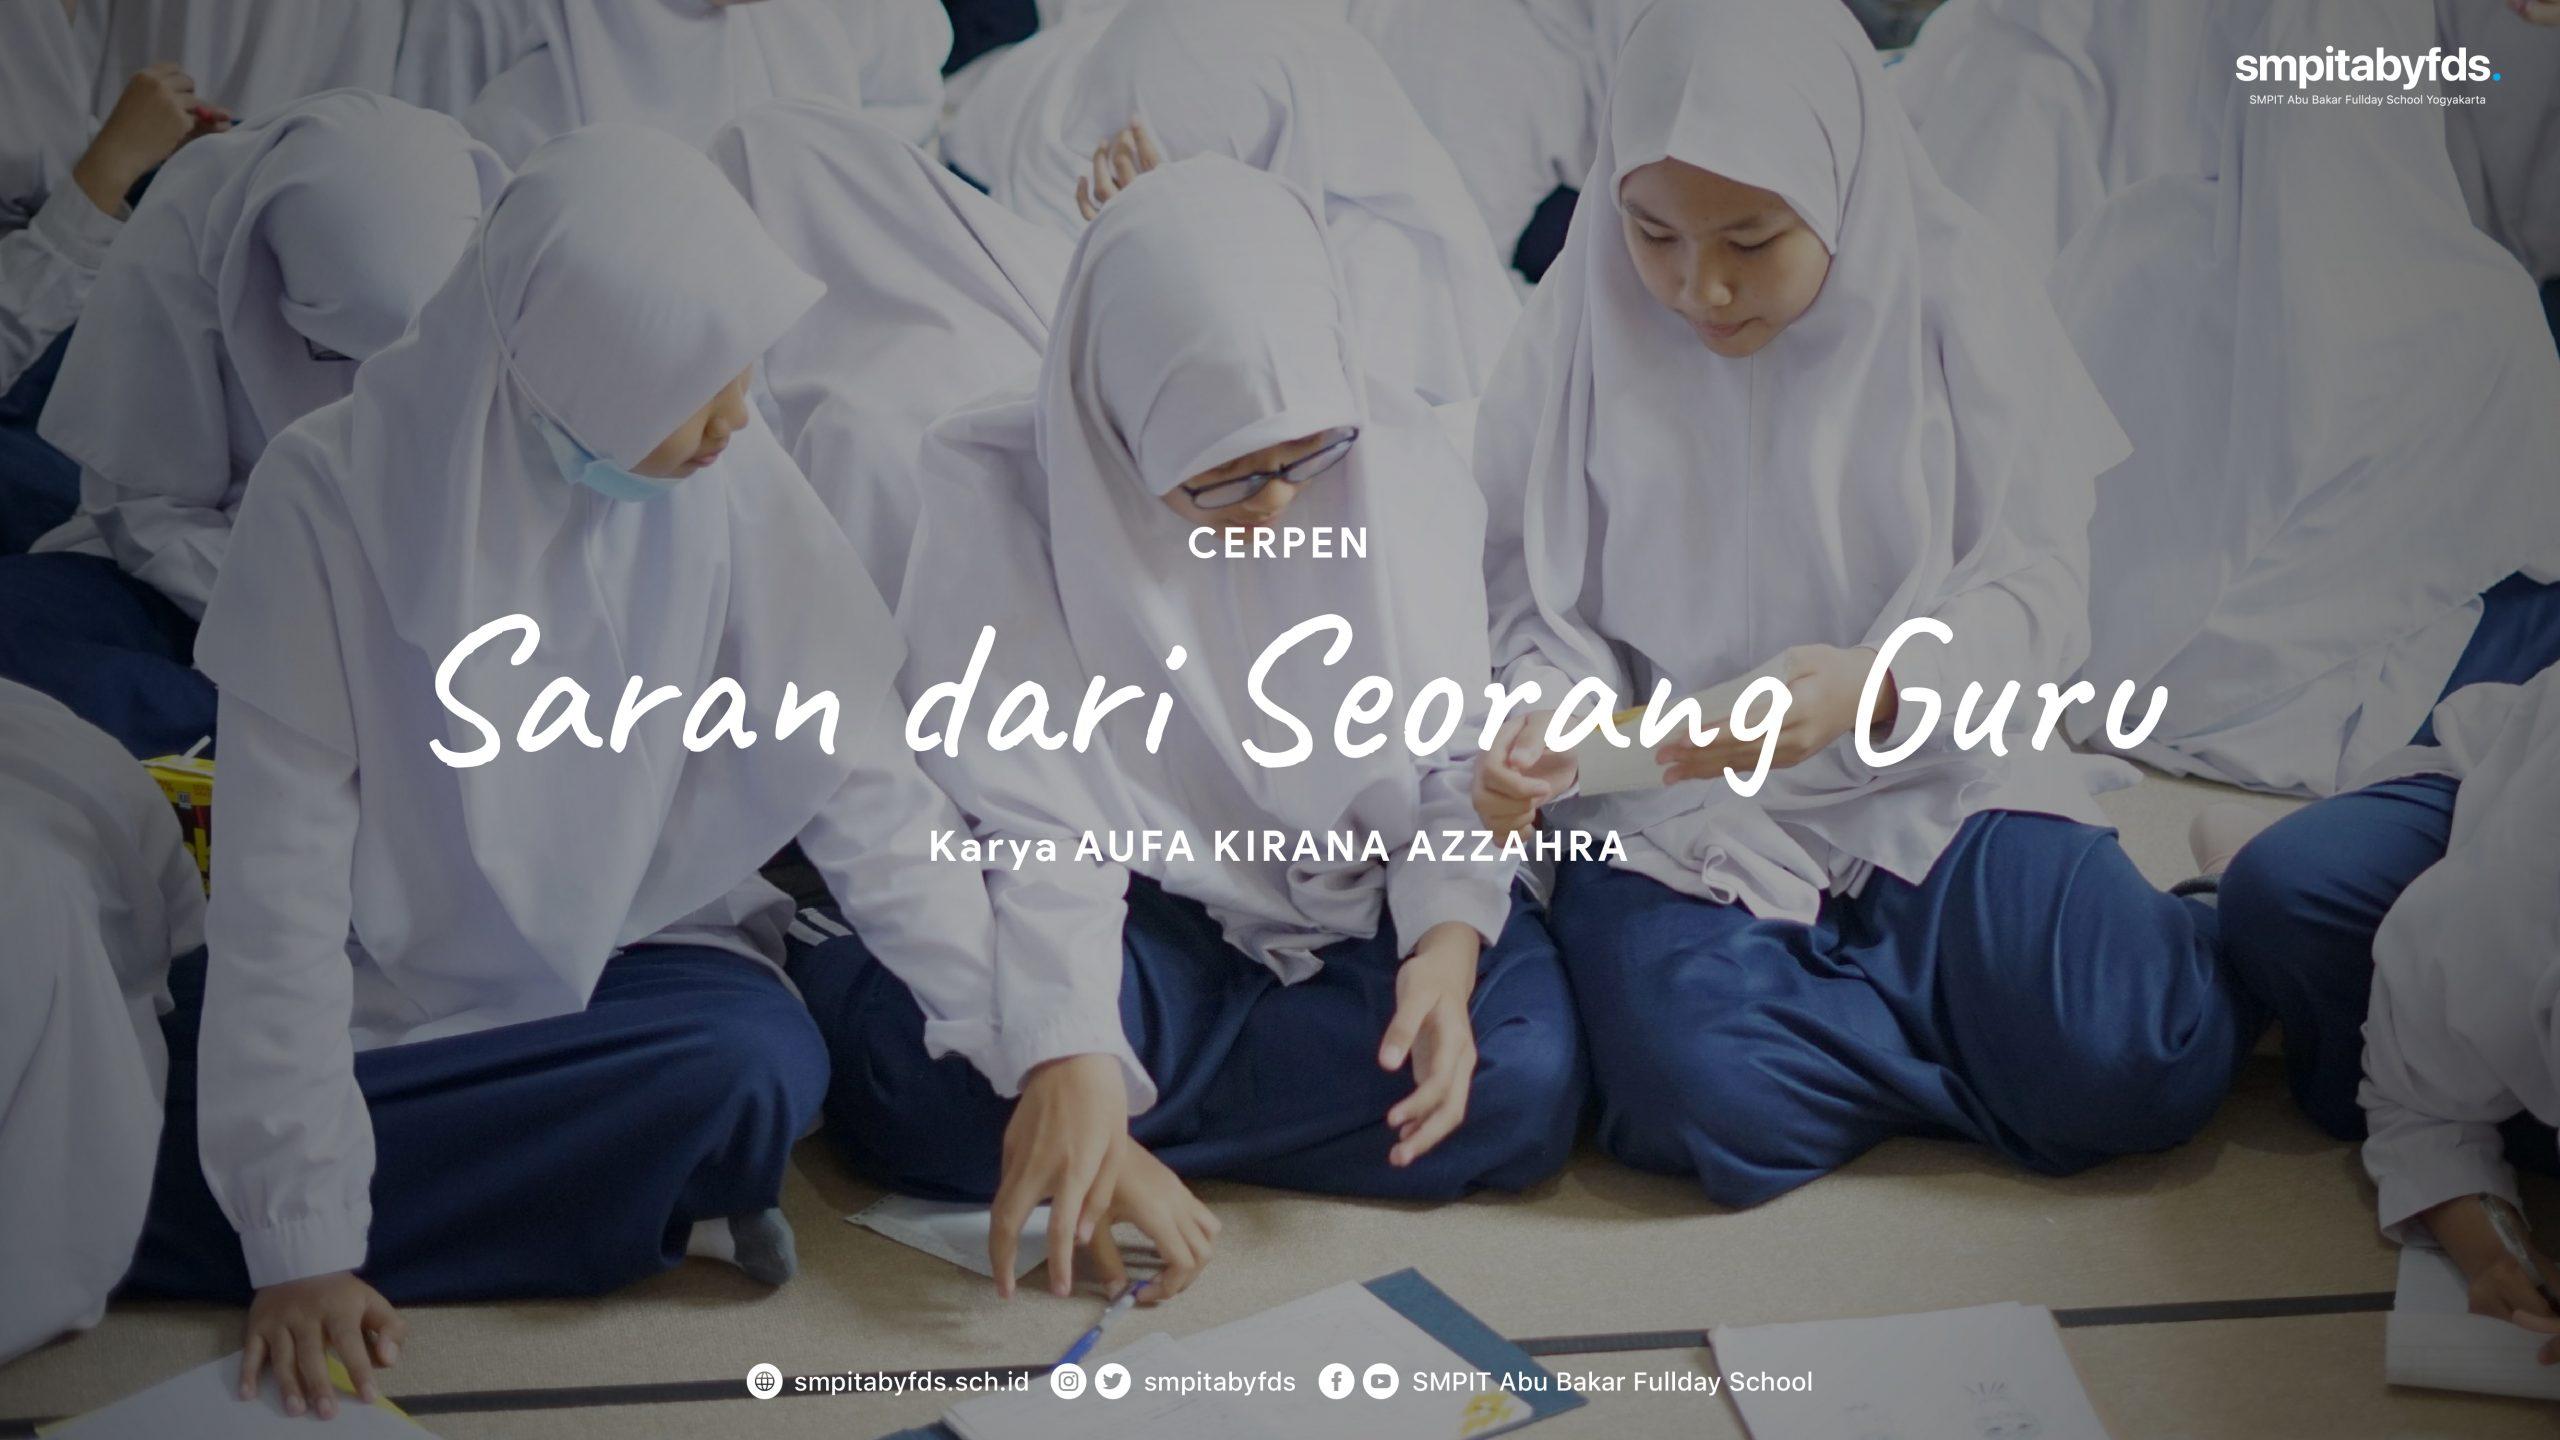 You are currently viewing Cerpen – Saran dari Seorang Guru karya Aufa Kirana Azzahra